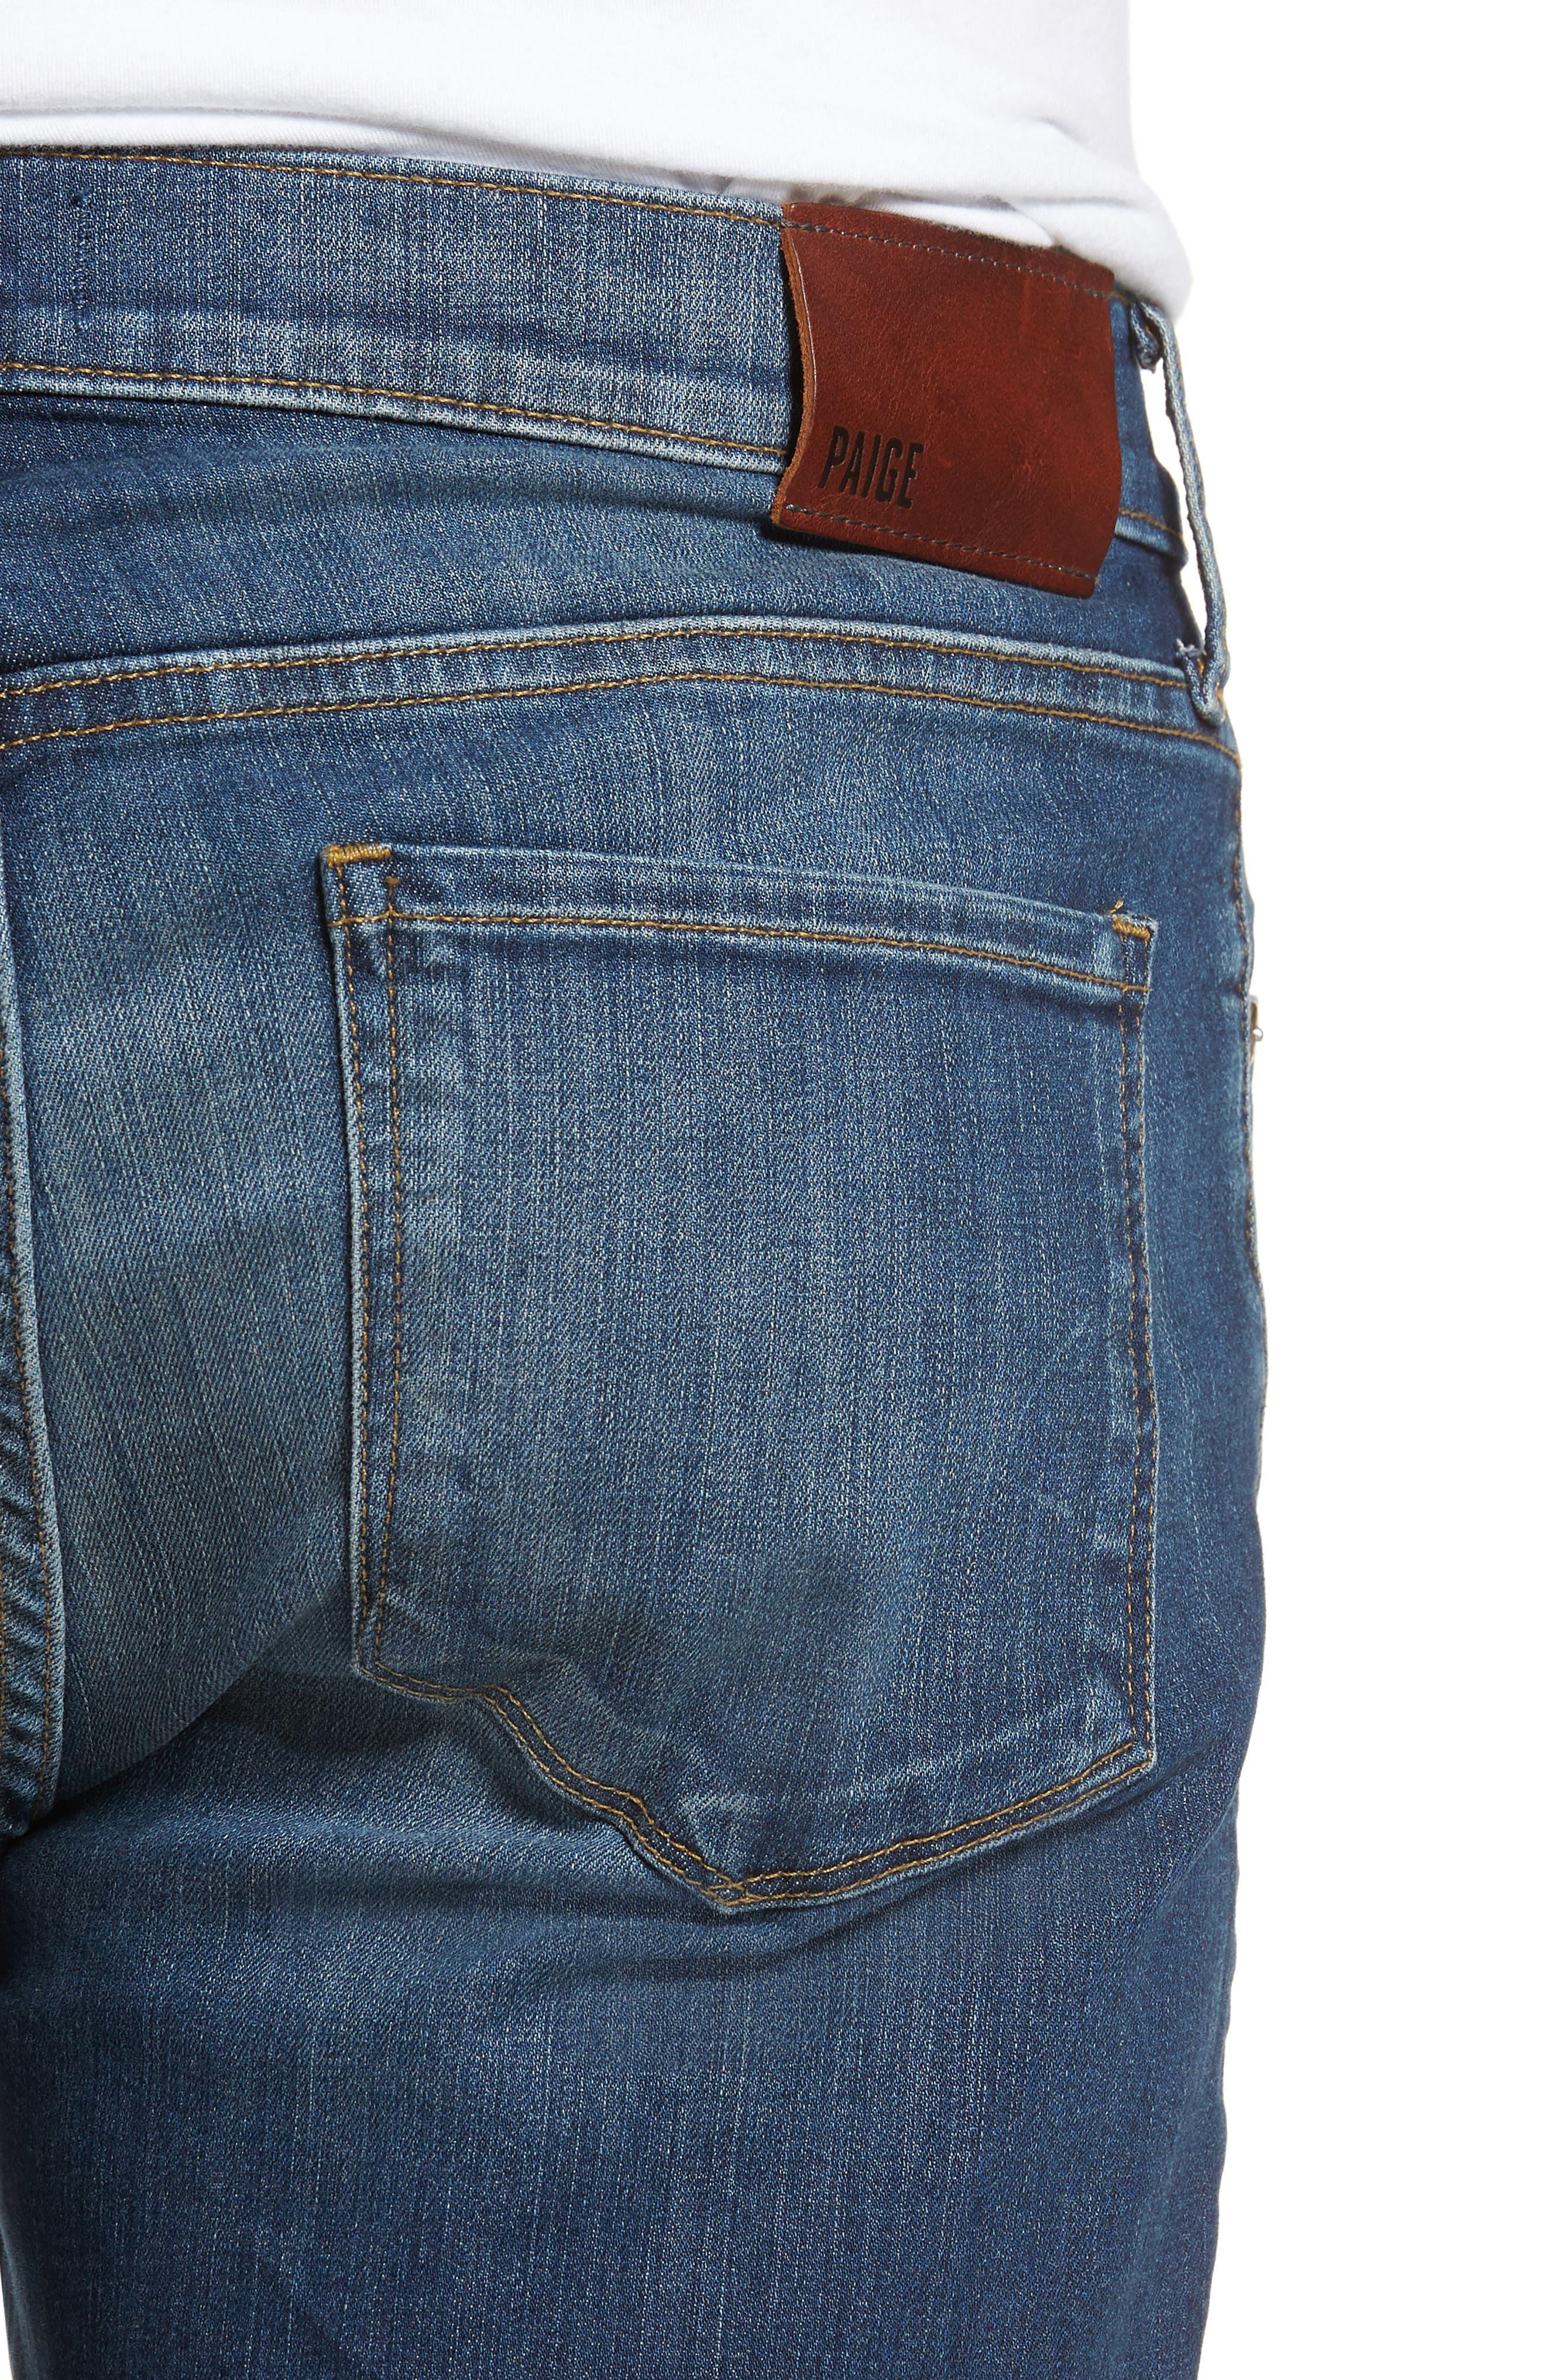 Federal Slim Straight Leg Jeans,                             Alternate thumbnail 4, color,                             Harlan